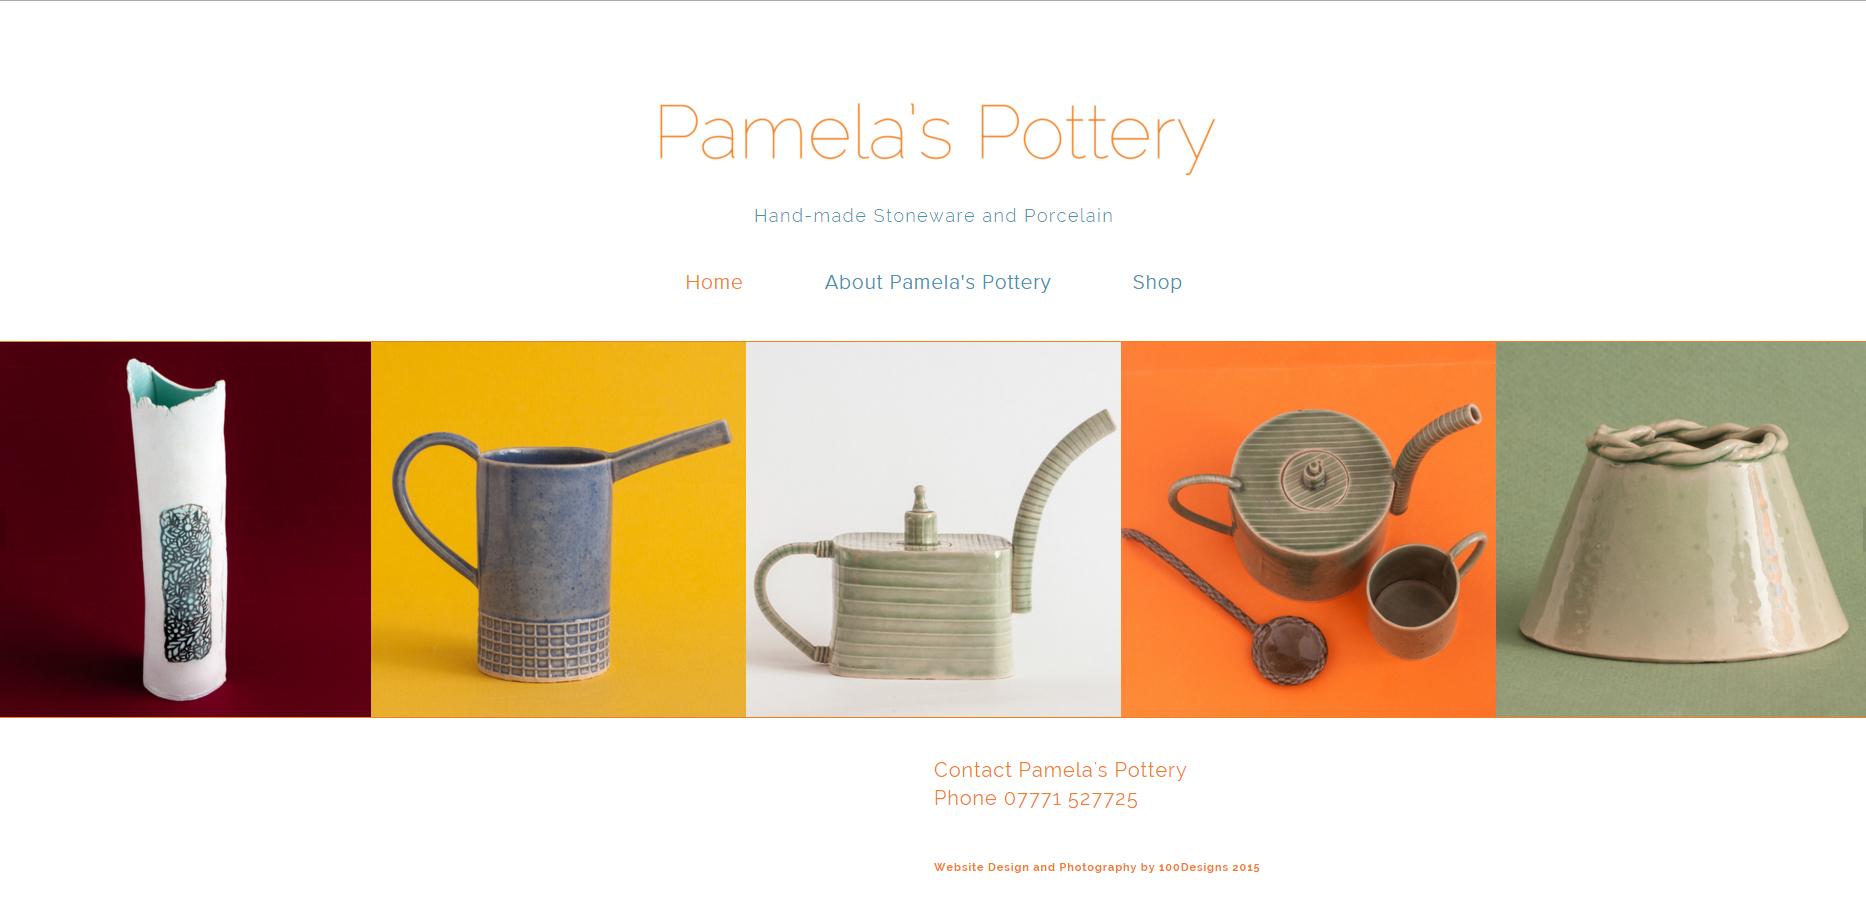 Pamela's Pottery Home Page